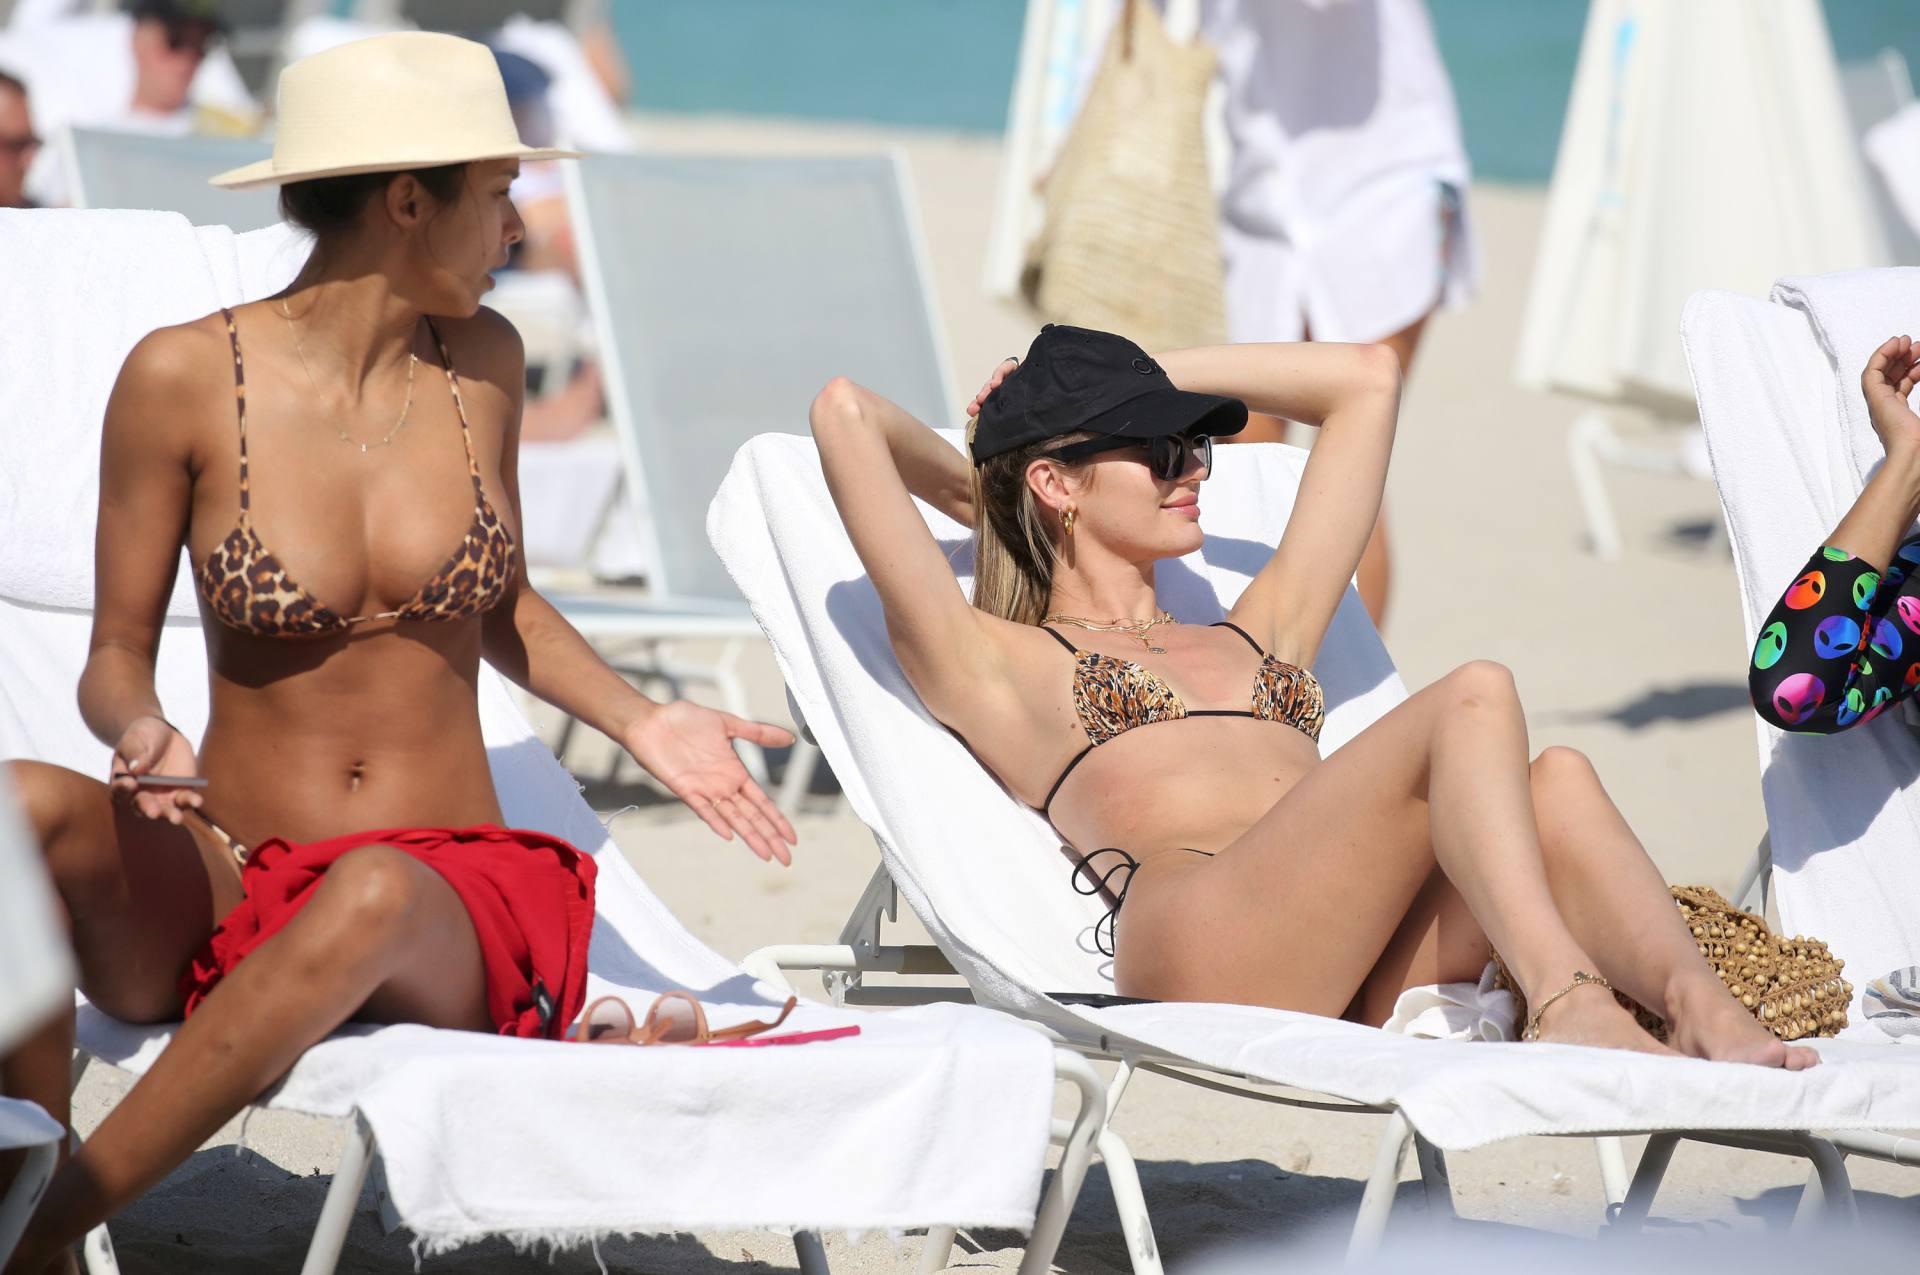 Candice Swanepoel And Lais Ribeiro On Beach